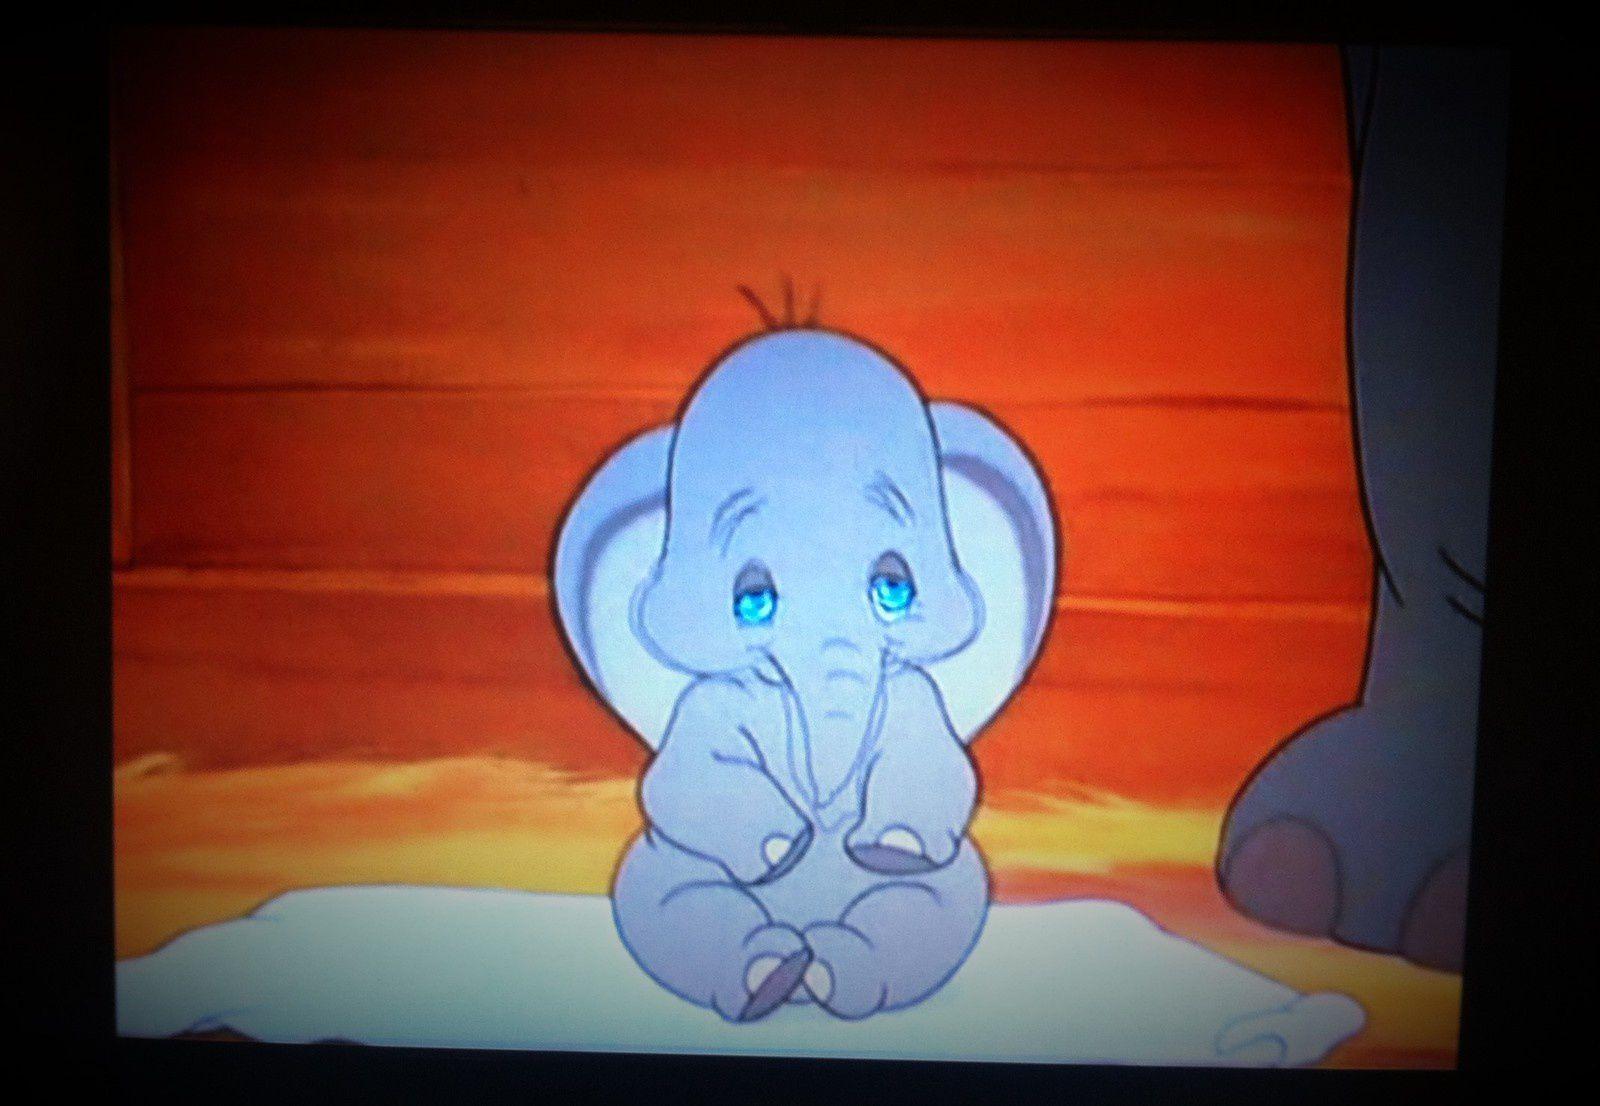 Youpi c'est vendredi challenge Diney - 2- Dumbo